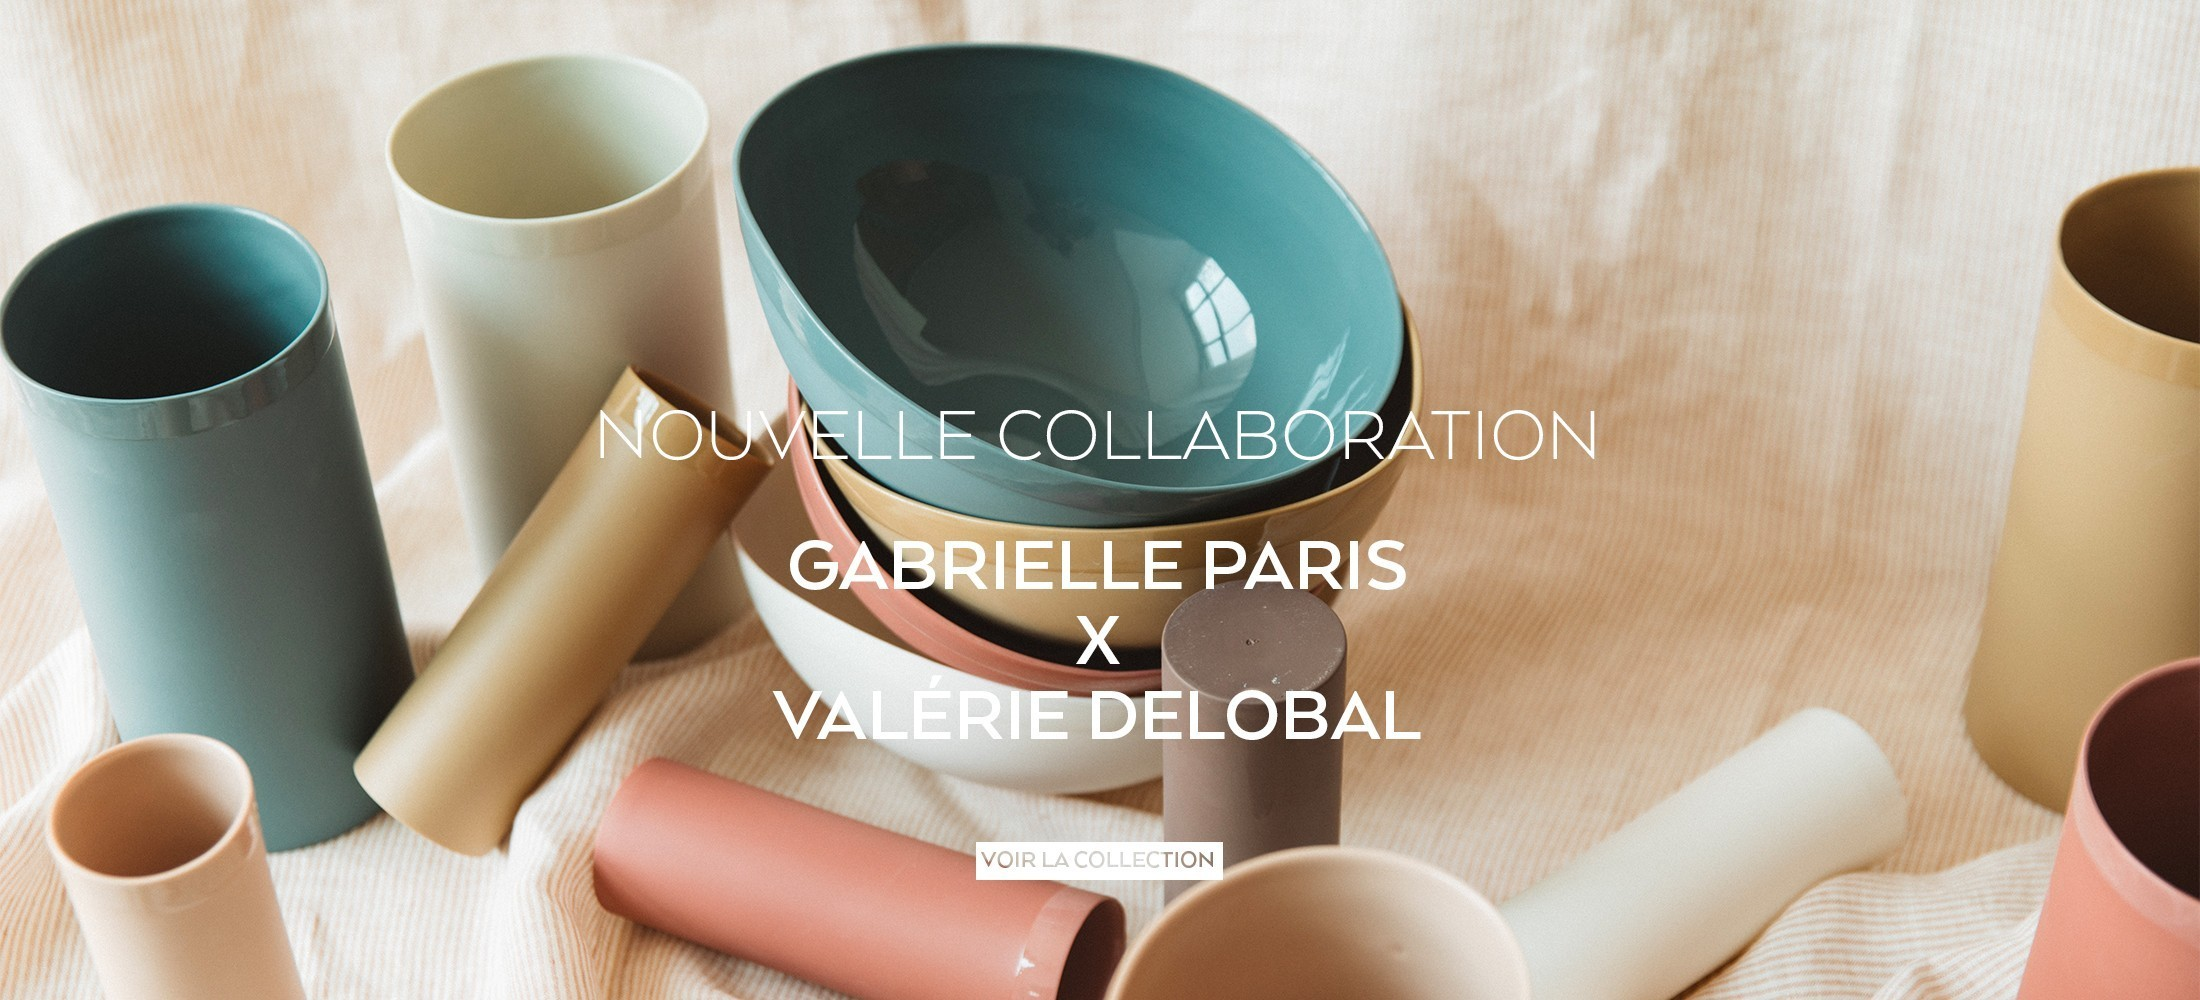 GABRIELLE X VALERIE DELOBAL